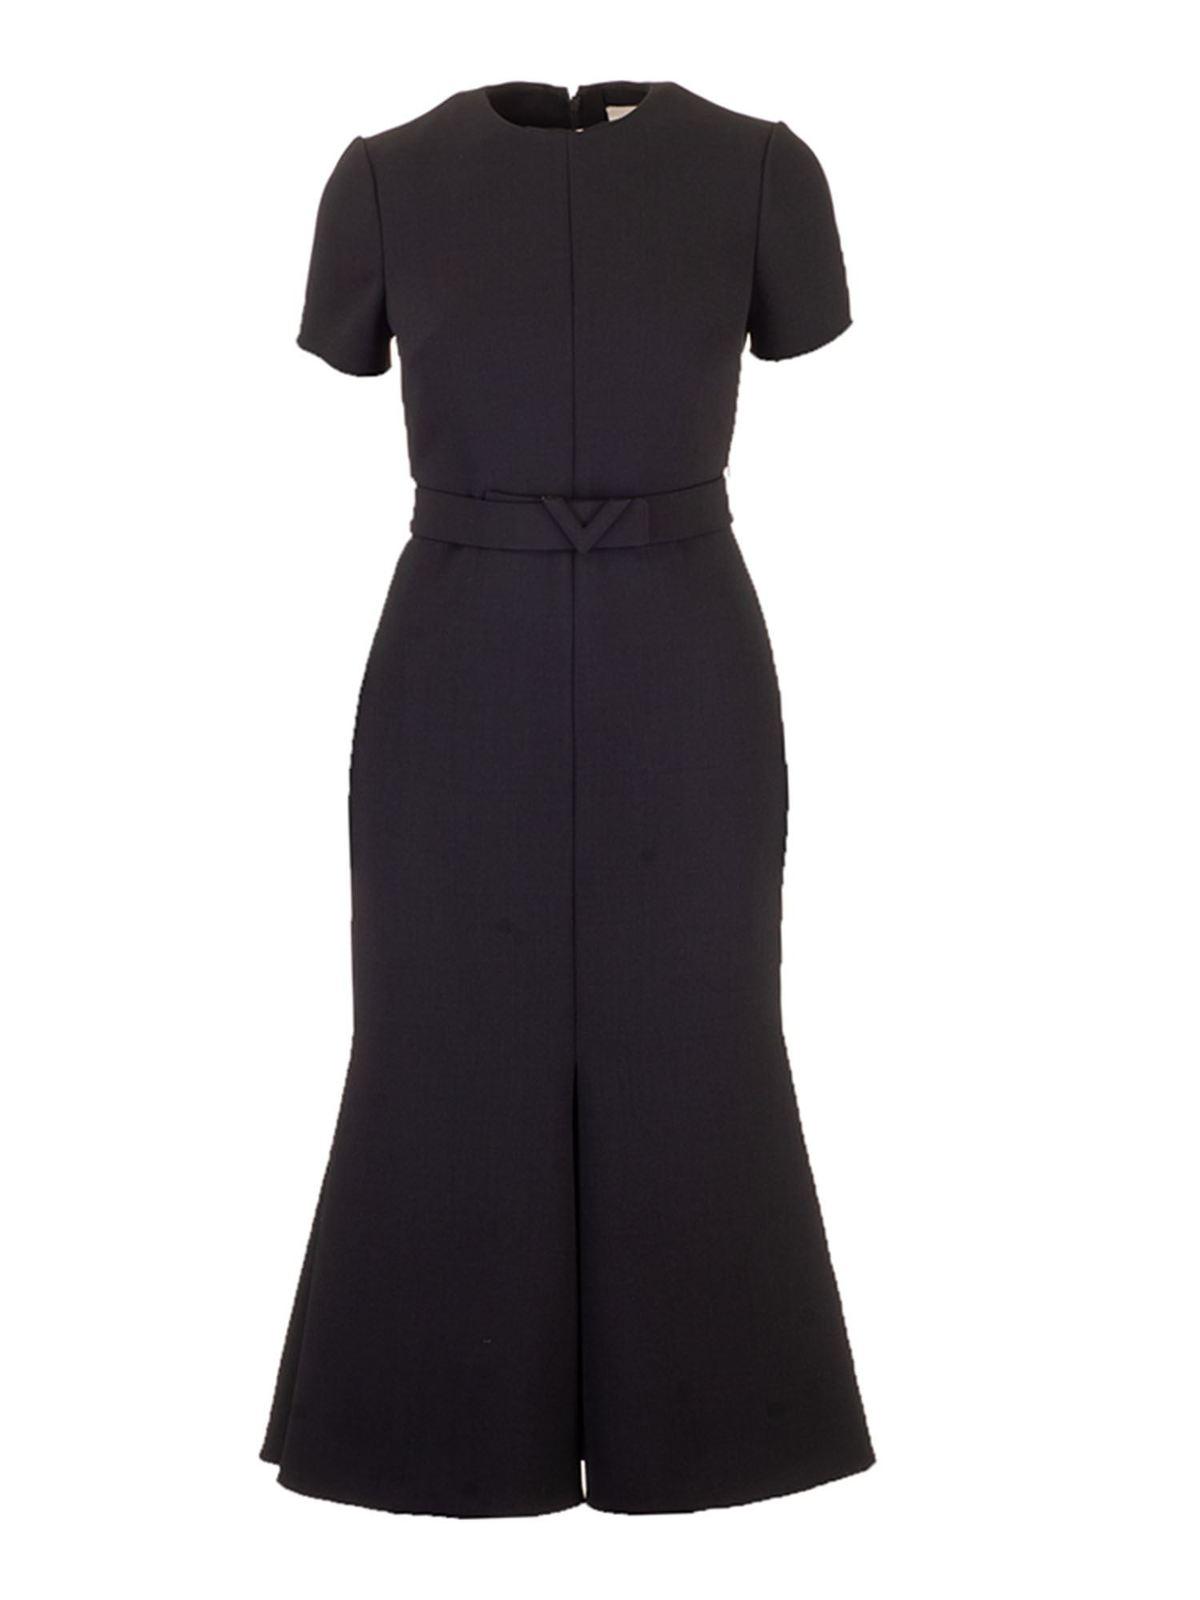 Valentino DOUBLE TECHNO WOOL DRESS IN BLACK